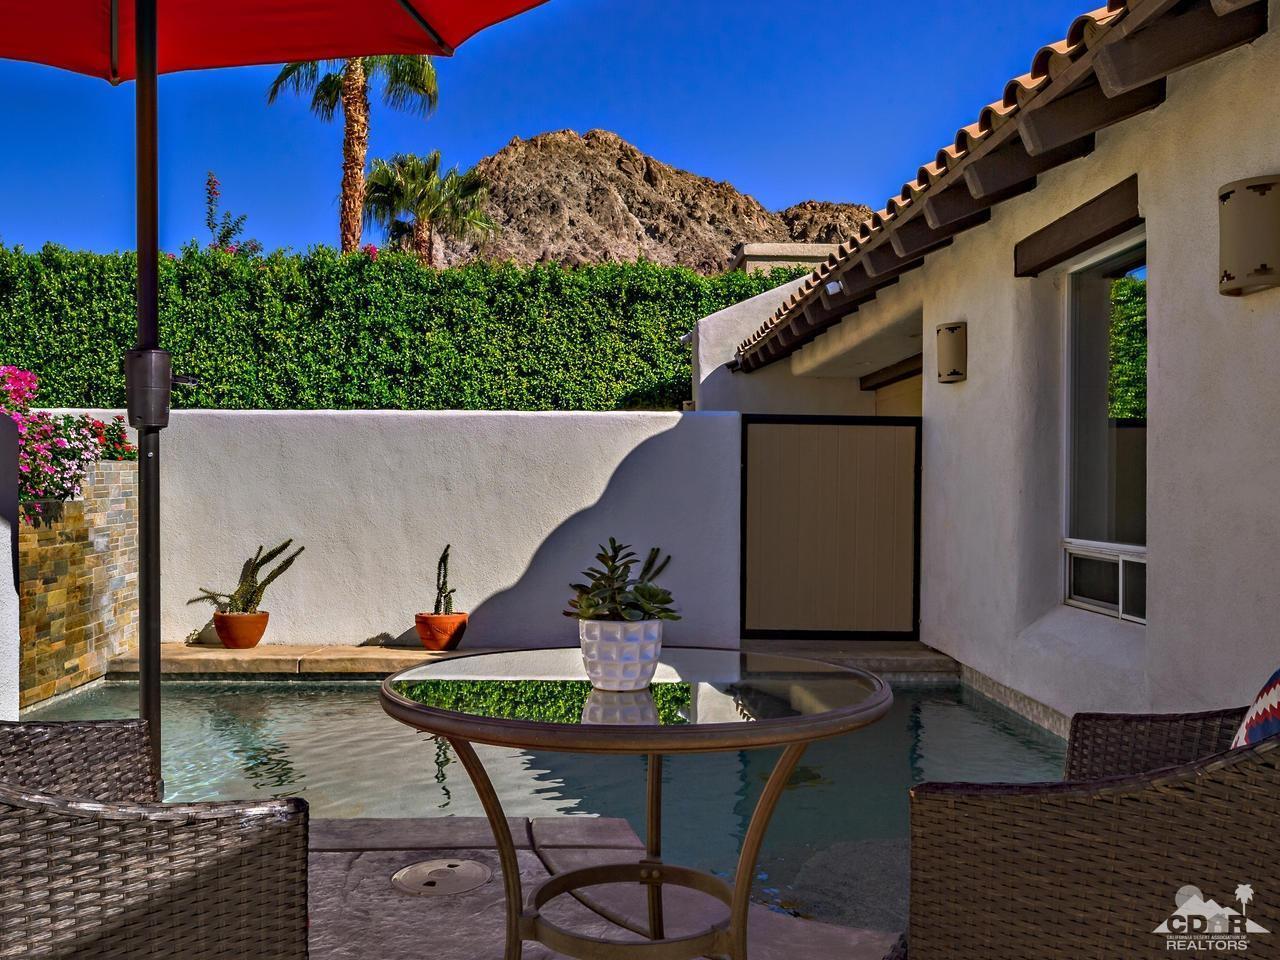 51340 Avenida Juarez, La Quinta, California 92253, 3 Bedrooms Bedrooms, ,3 BathroomsBathrooms,Residential,For Sale,51340 Avenida Juarez,219044113